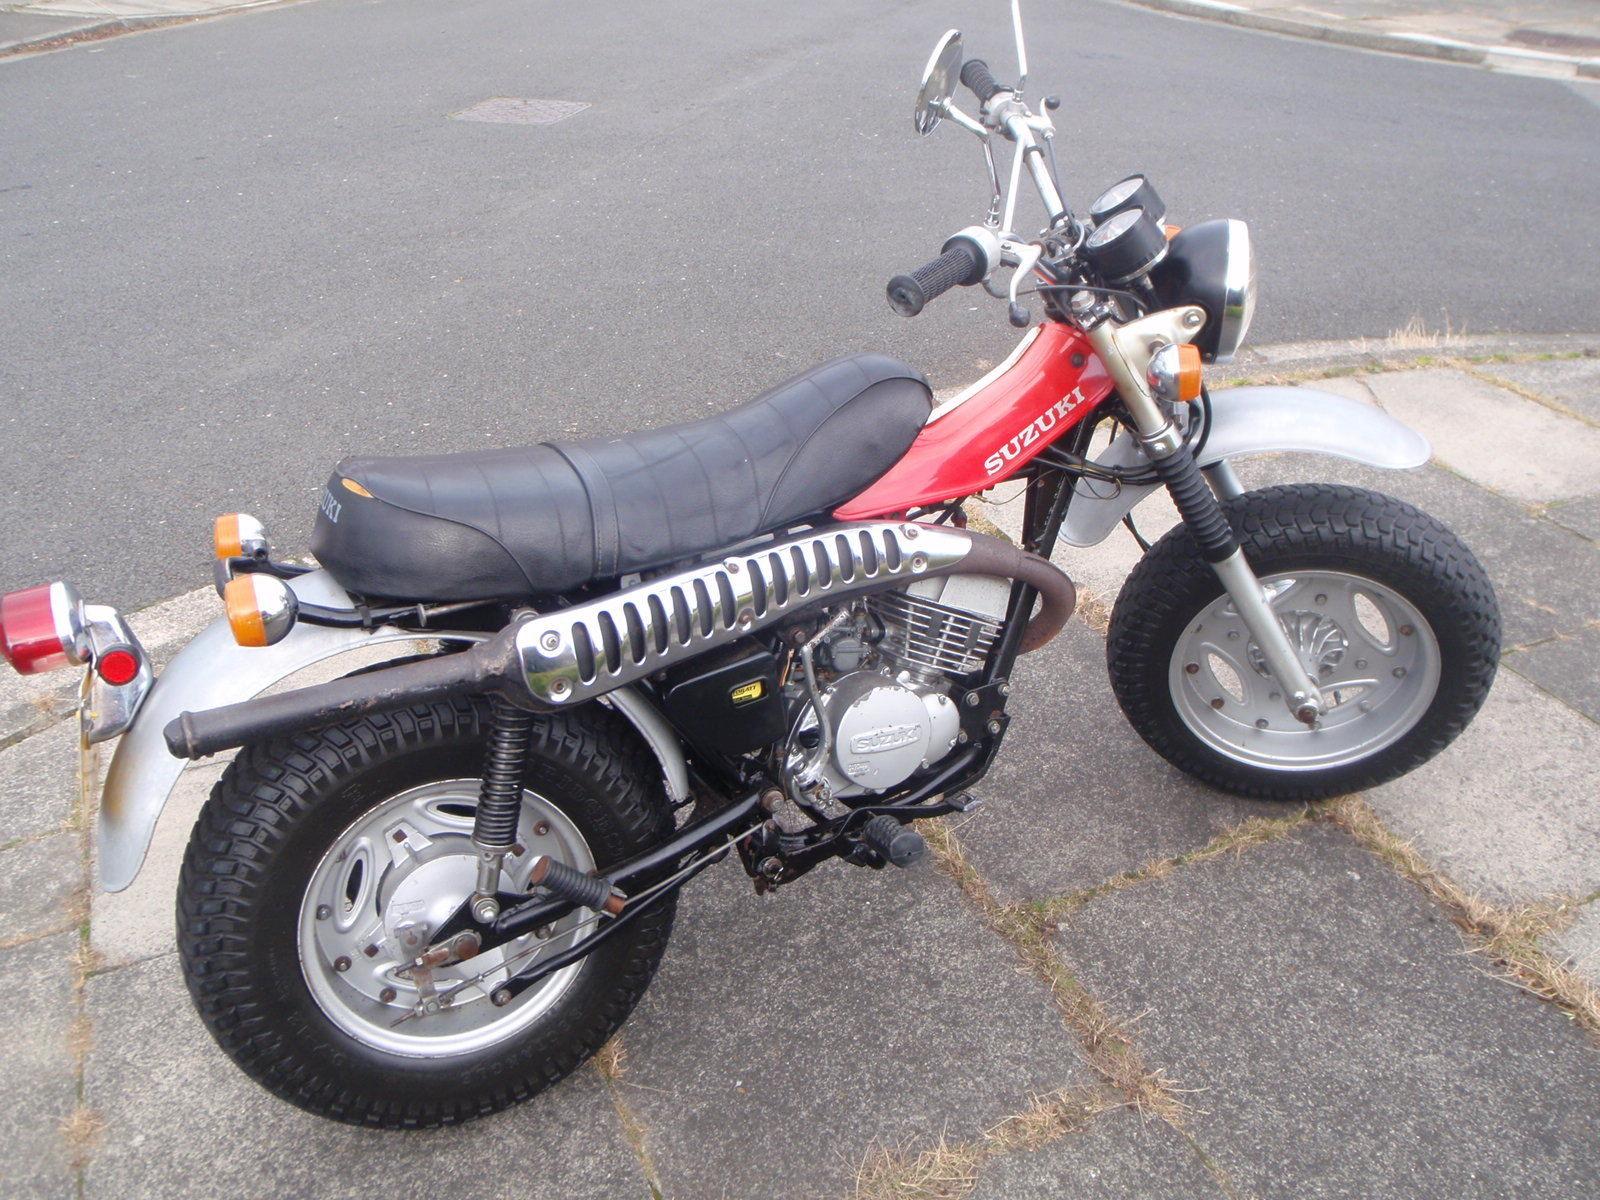 1975 suzuki rv 125 sand bike monkey bike barn find genuine. Black Bedroom Furniture Sets. Home Design Ideas